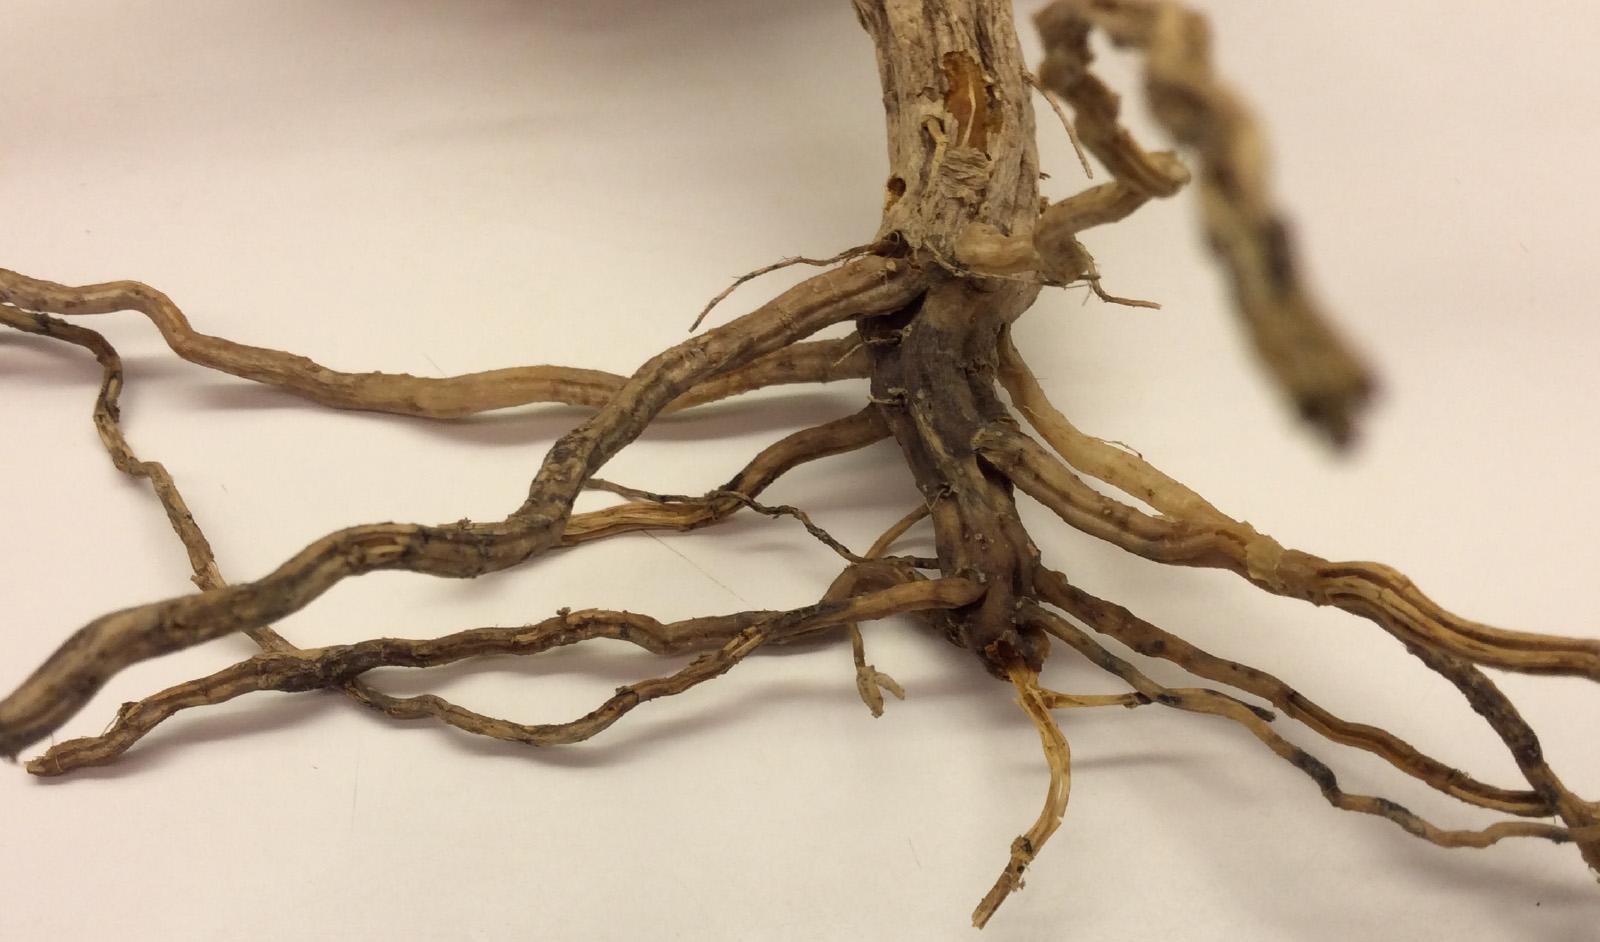 Photo: Hannah Rivedal, © Oregon State University Figure 6. Squash root rot.